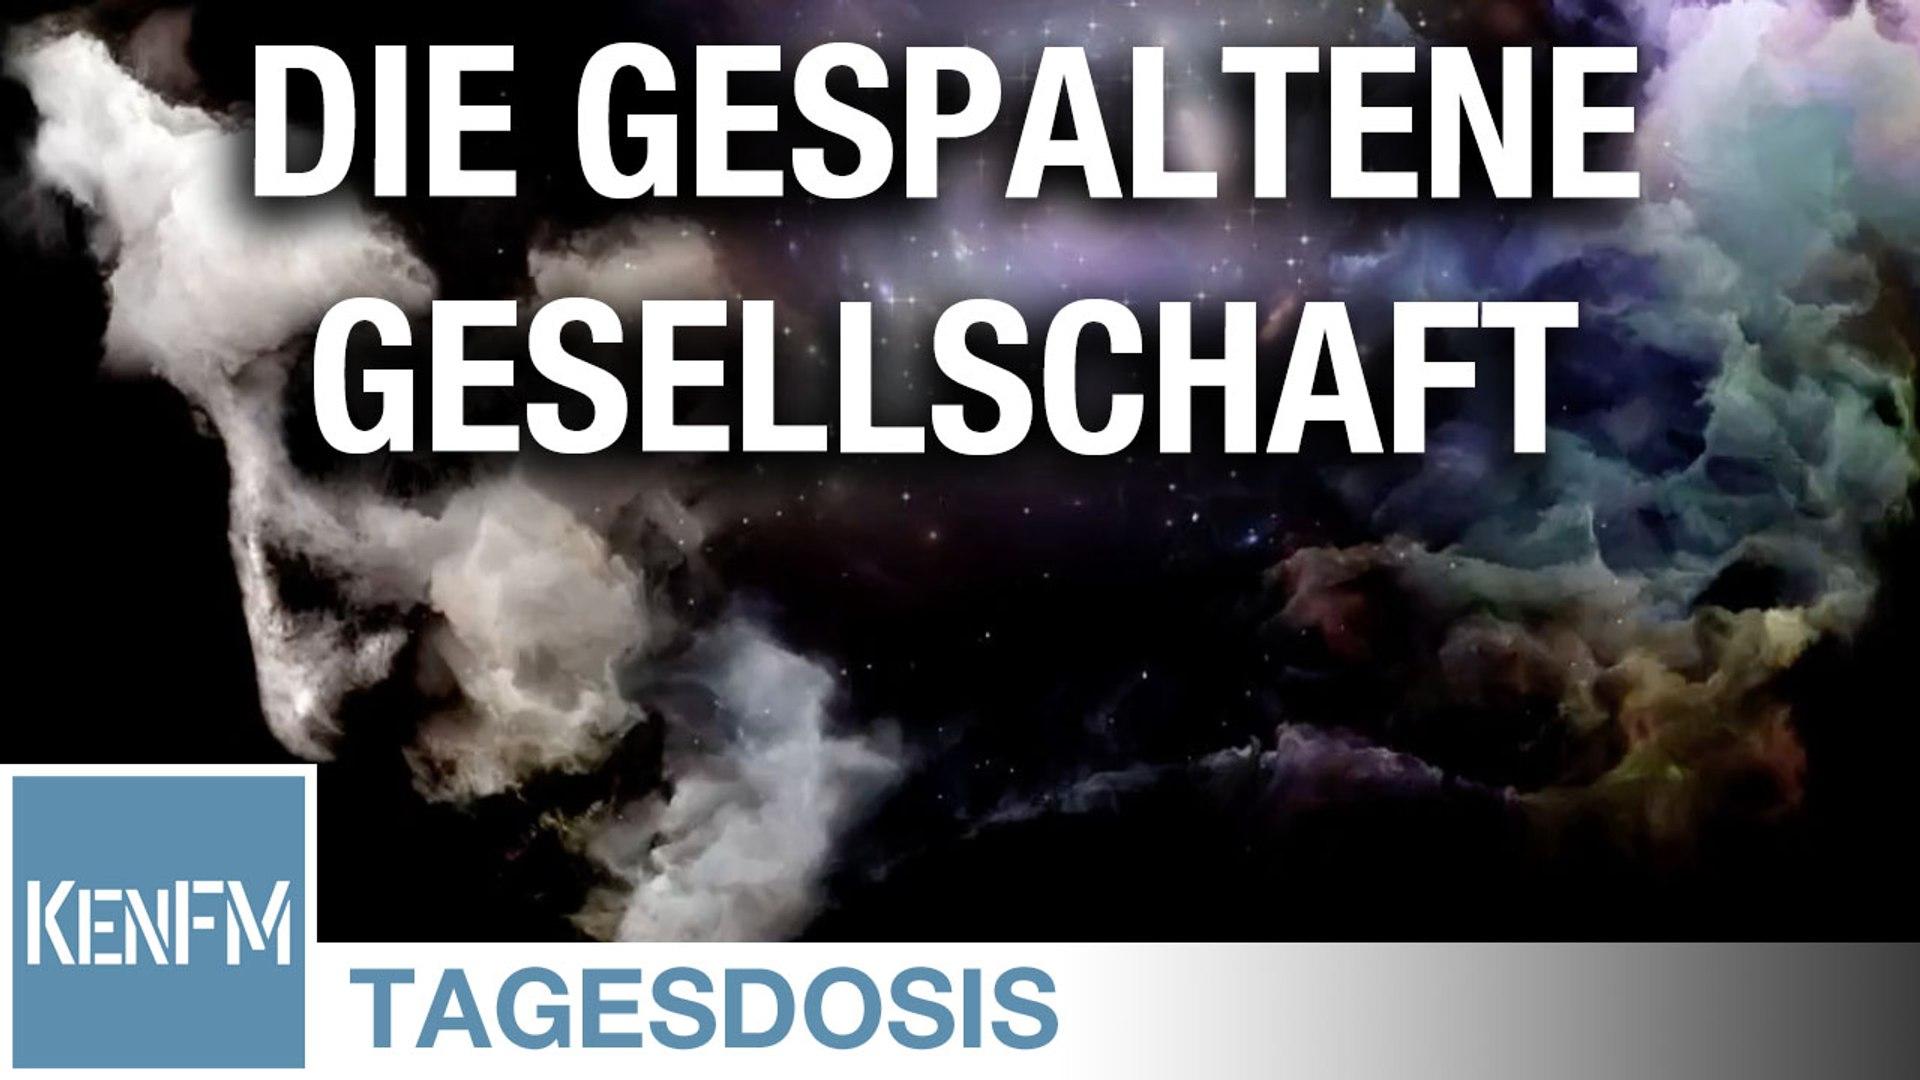 Die gespaltene Gesellschaft - Tagesdosis 17.6.2020